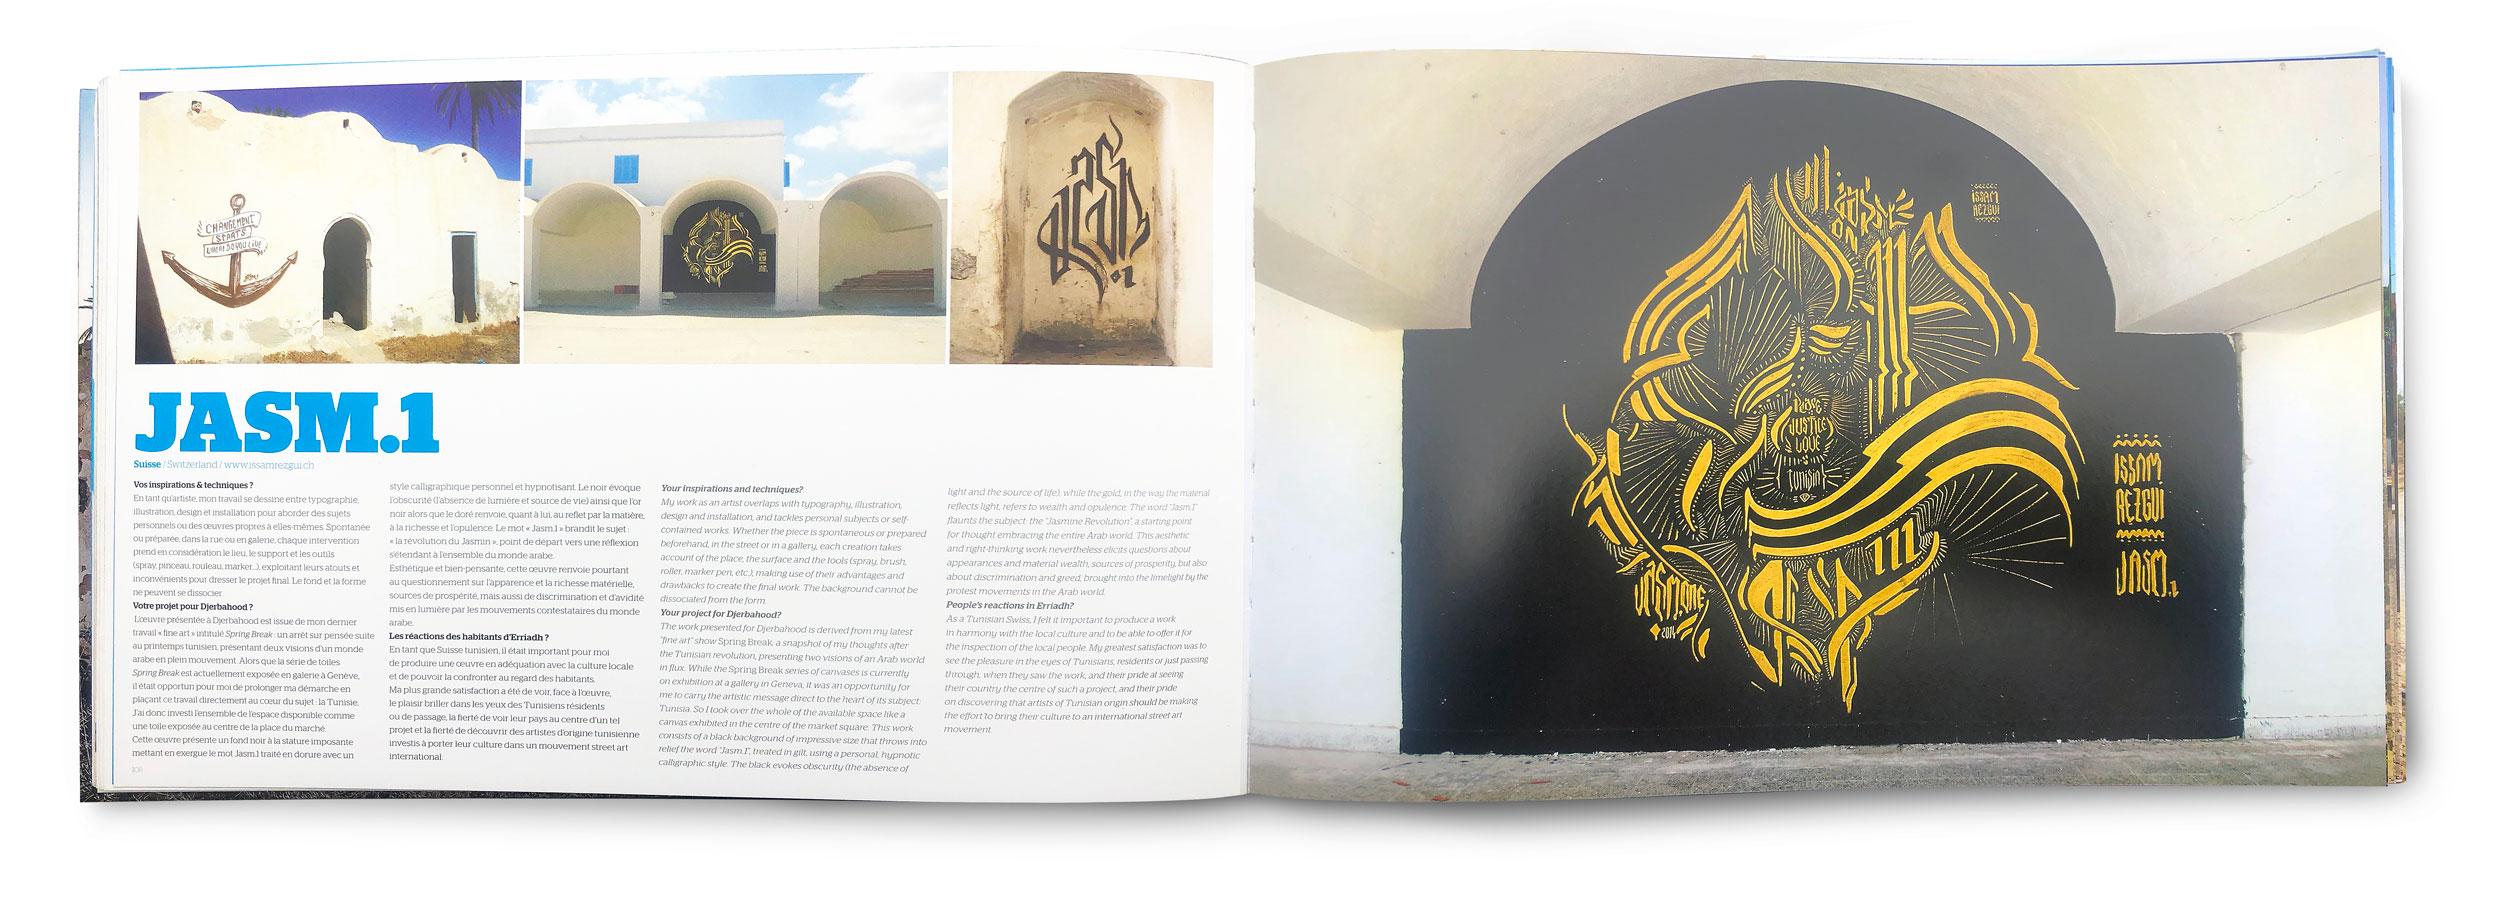 book djerbahood graffiti street art djerba issam rezgui jasm one jasm jasm1 jasm.1 tunisia erriadh calligraphy black gold